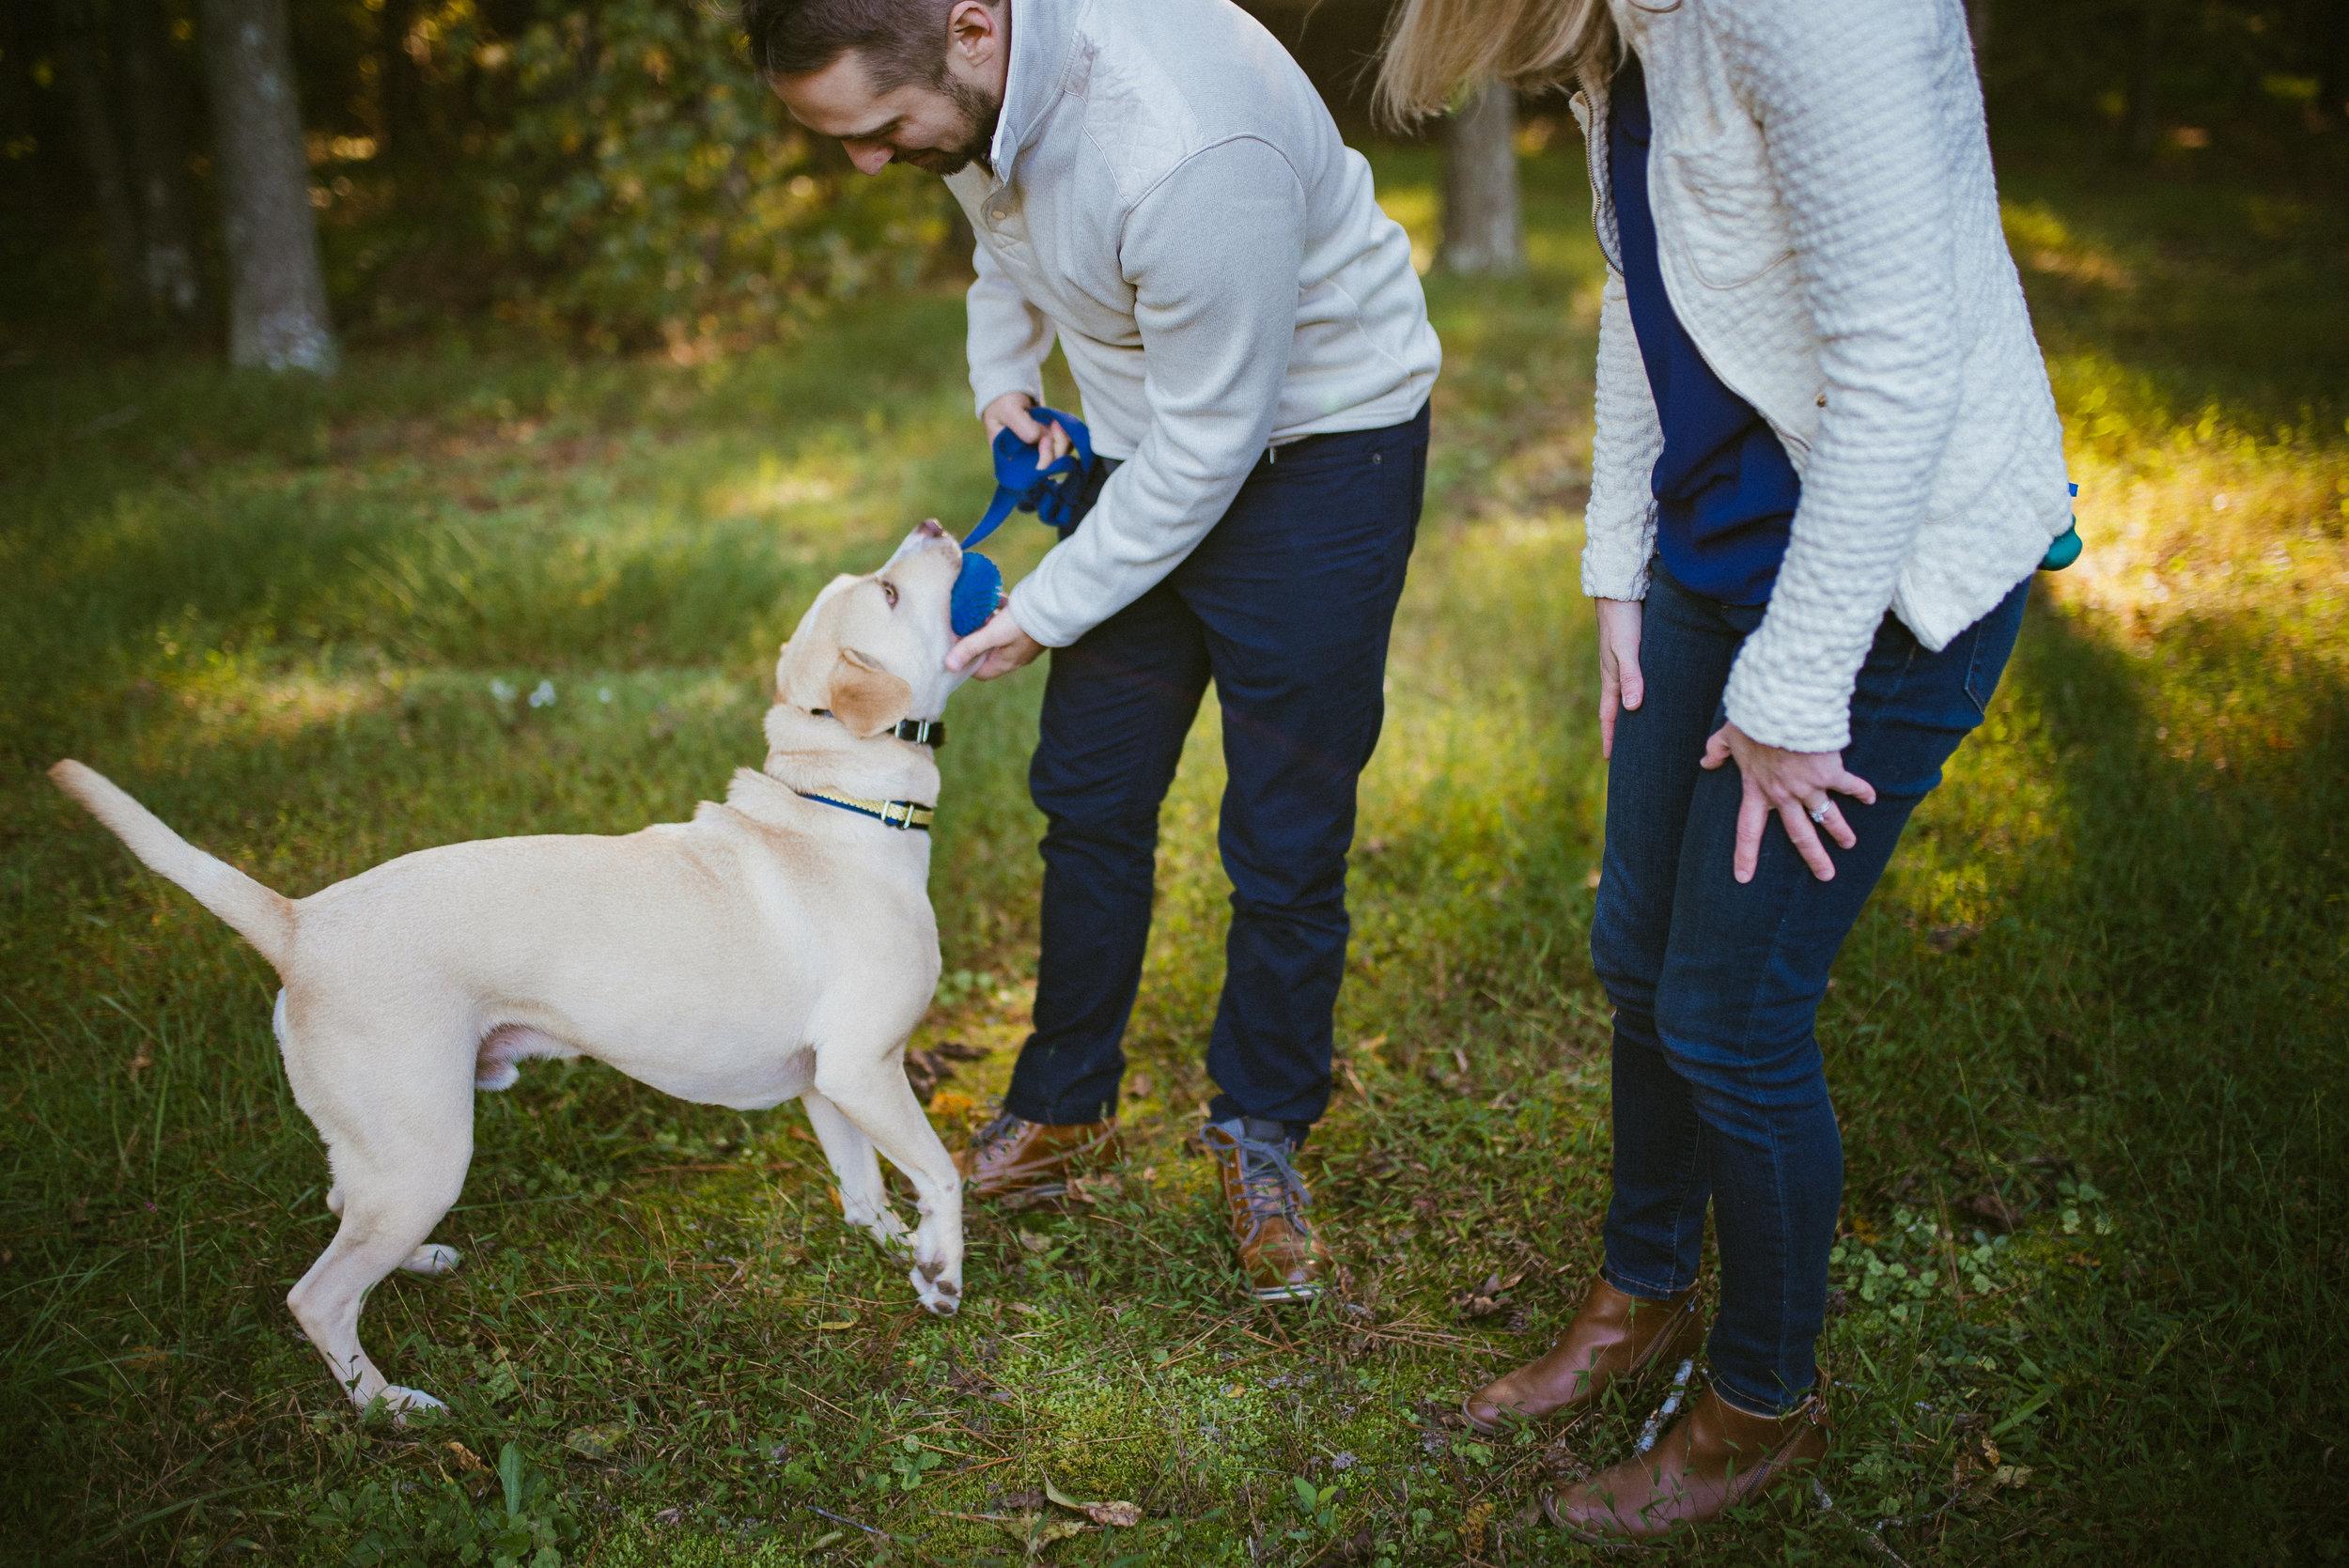 raleigh engagement - pet engagement photographer - raleigh photographer